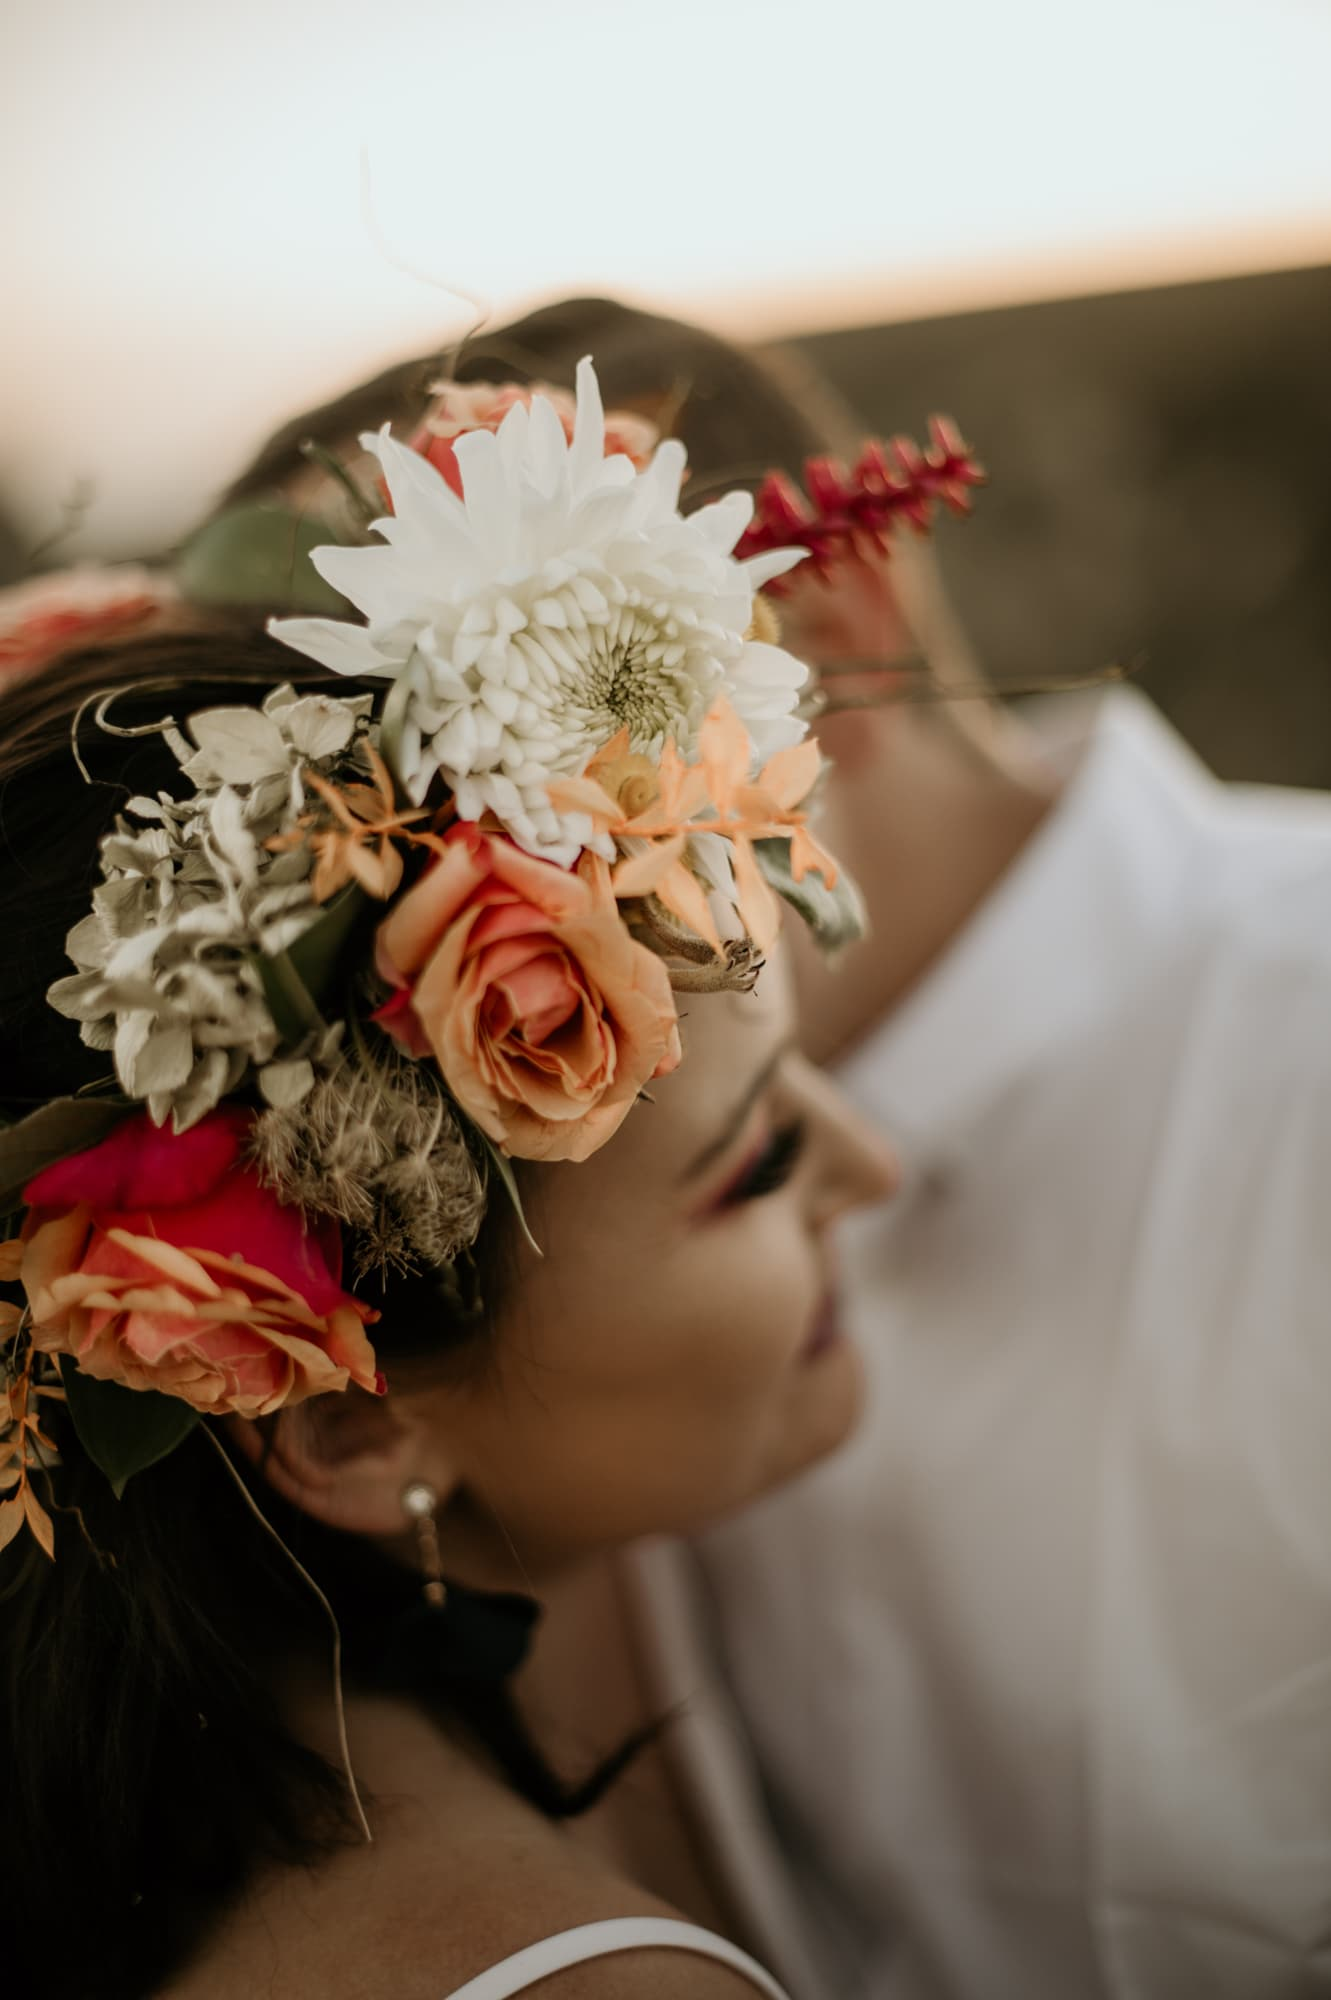 jesann-freddie-kranshoek-engagement-June-Richards-Photography-Destination-Weddings-Elopements-Garden-Route-29